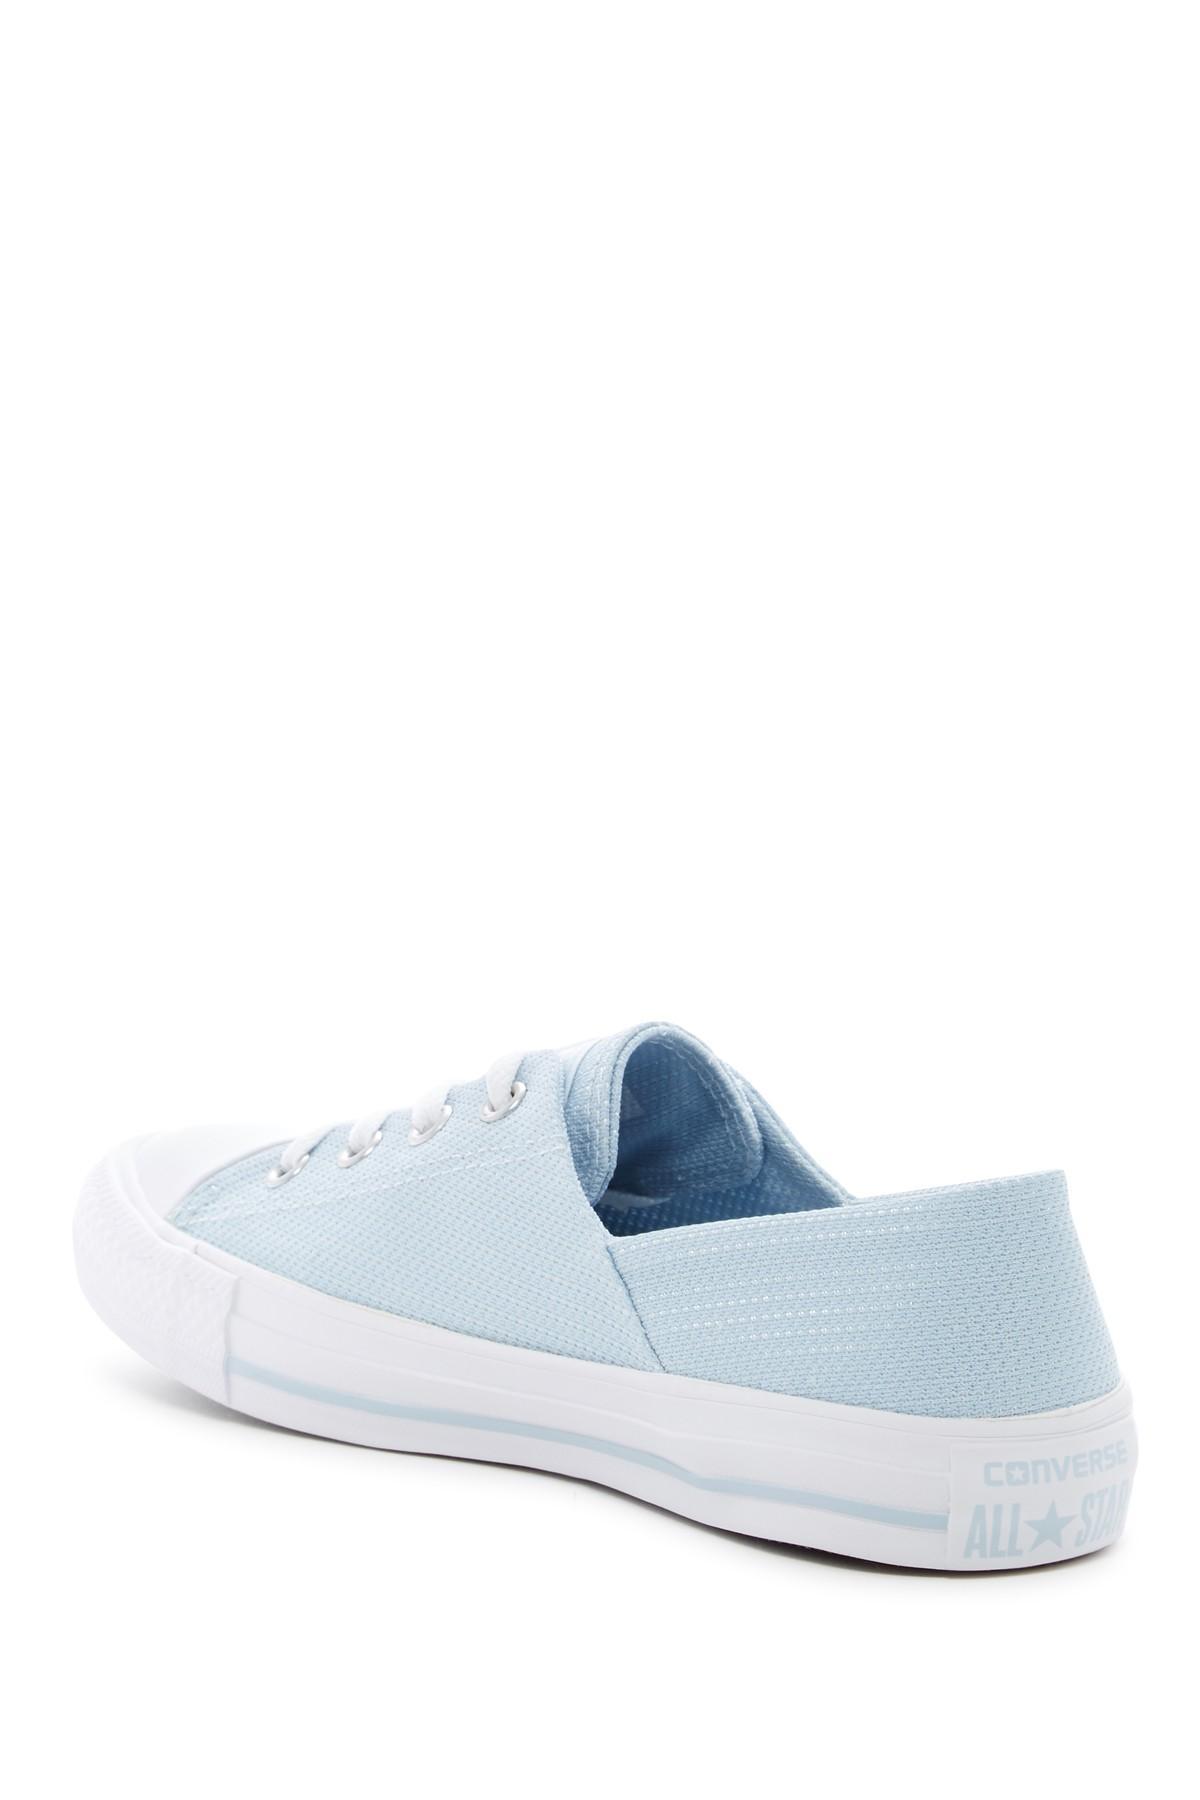 568536534c5c7c Converse - Multicolor Chuck Taylor All Star Coral Oxford Sneaker (women) -  Lyst. View fullscreen